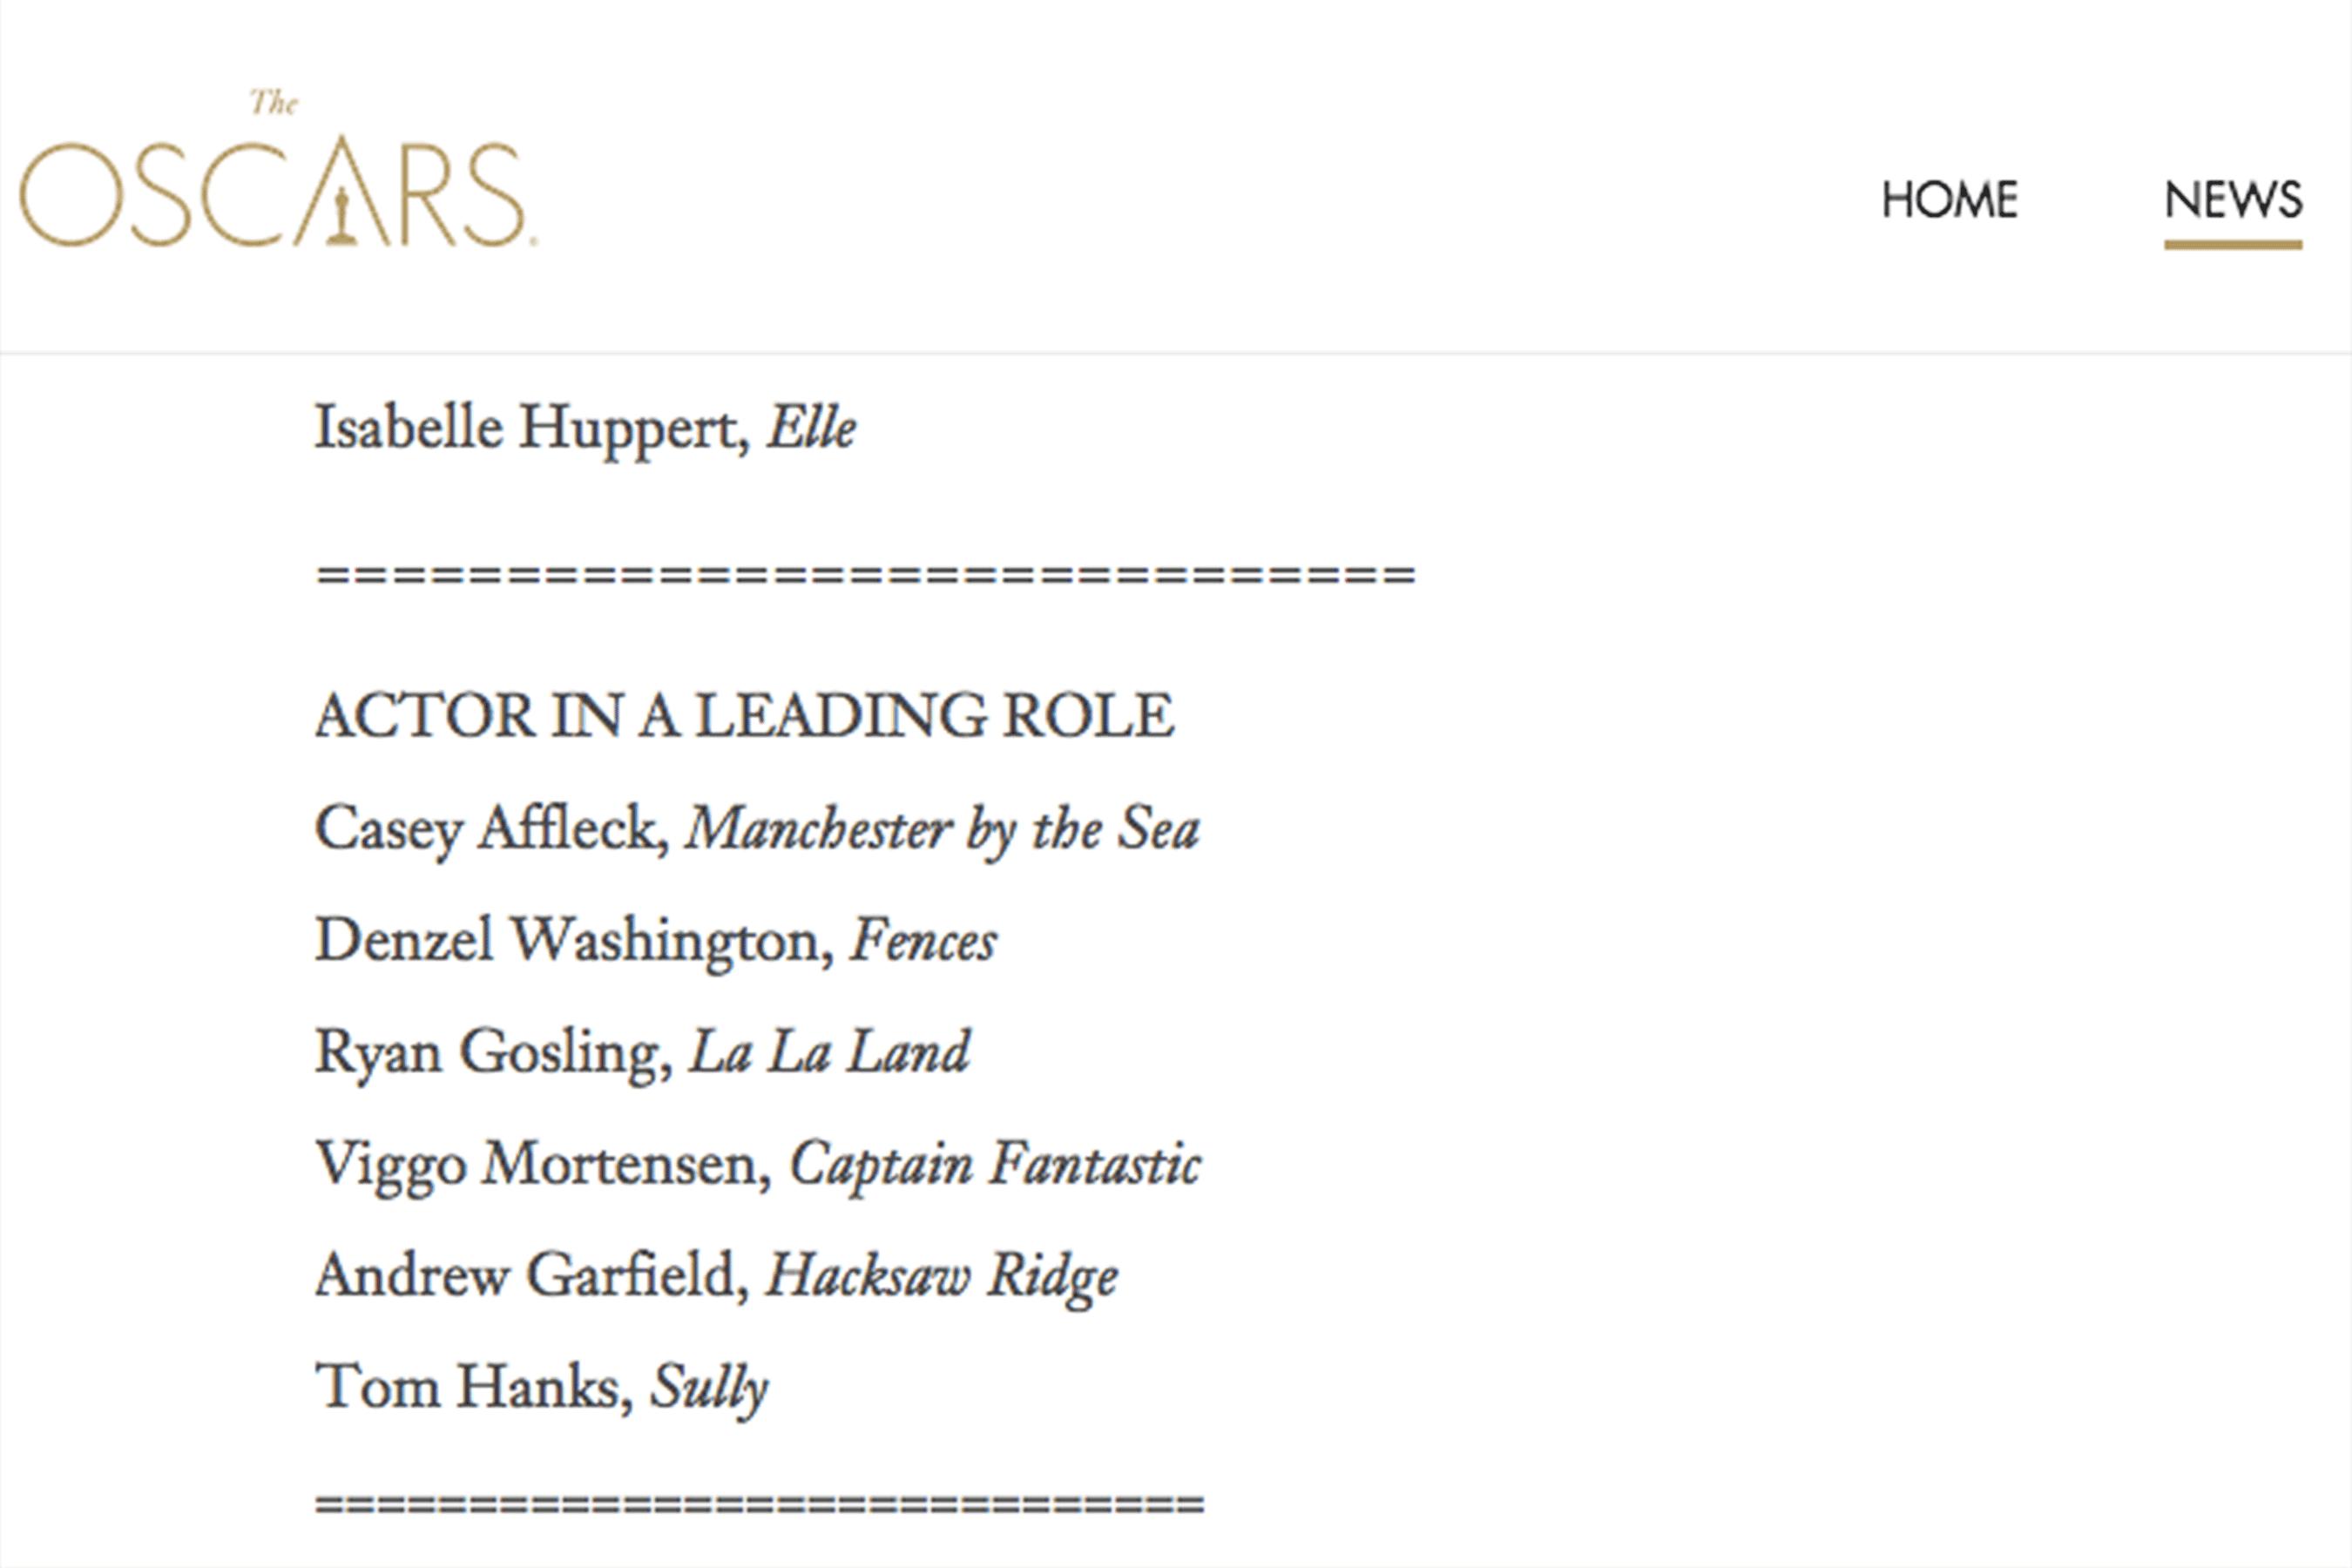 El error de la Academia. (Captura: Oscars.com)